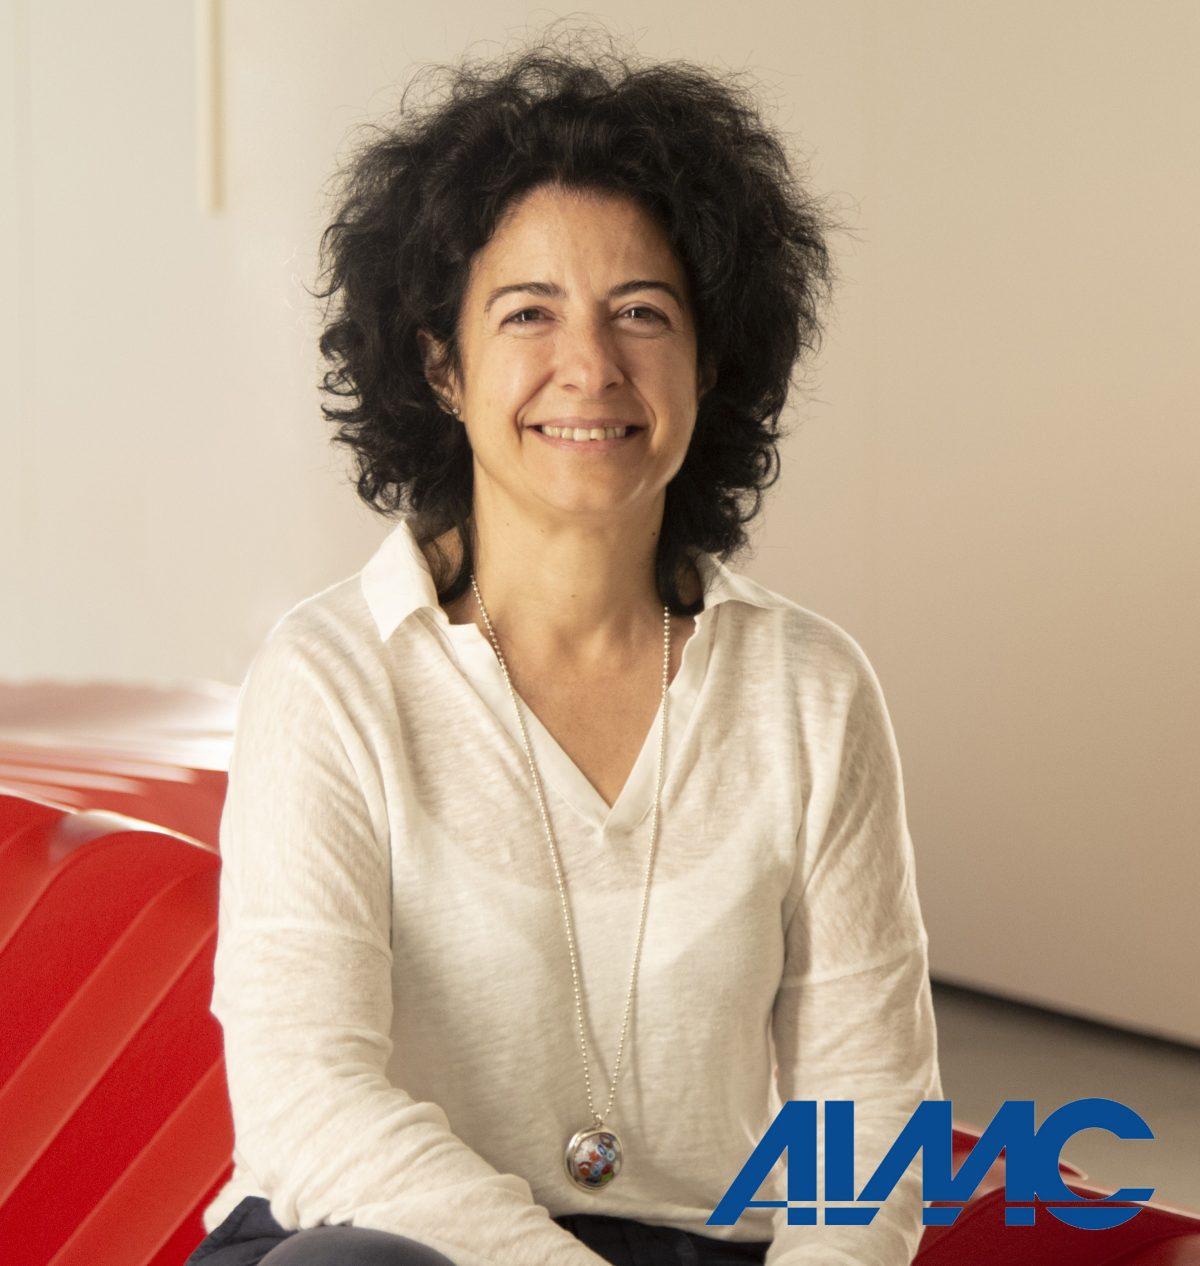 Marga Ollero, nueva Presidenta de la Junta Directiva de AIMC